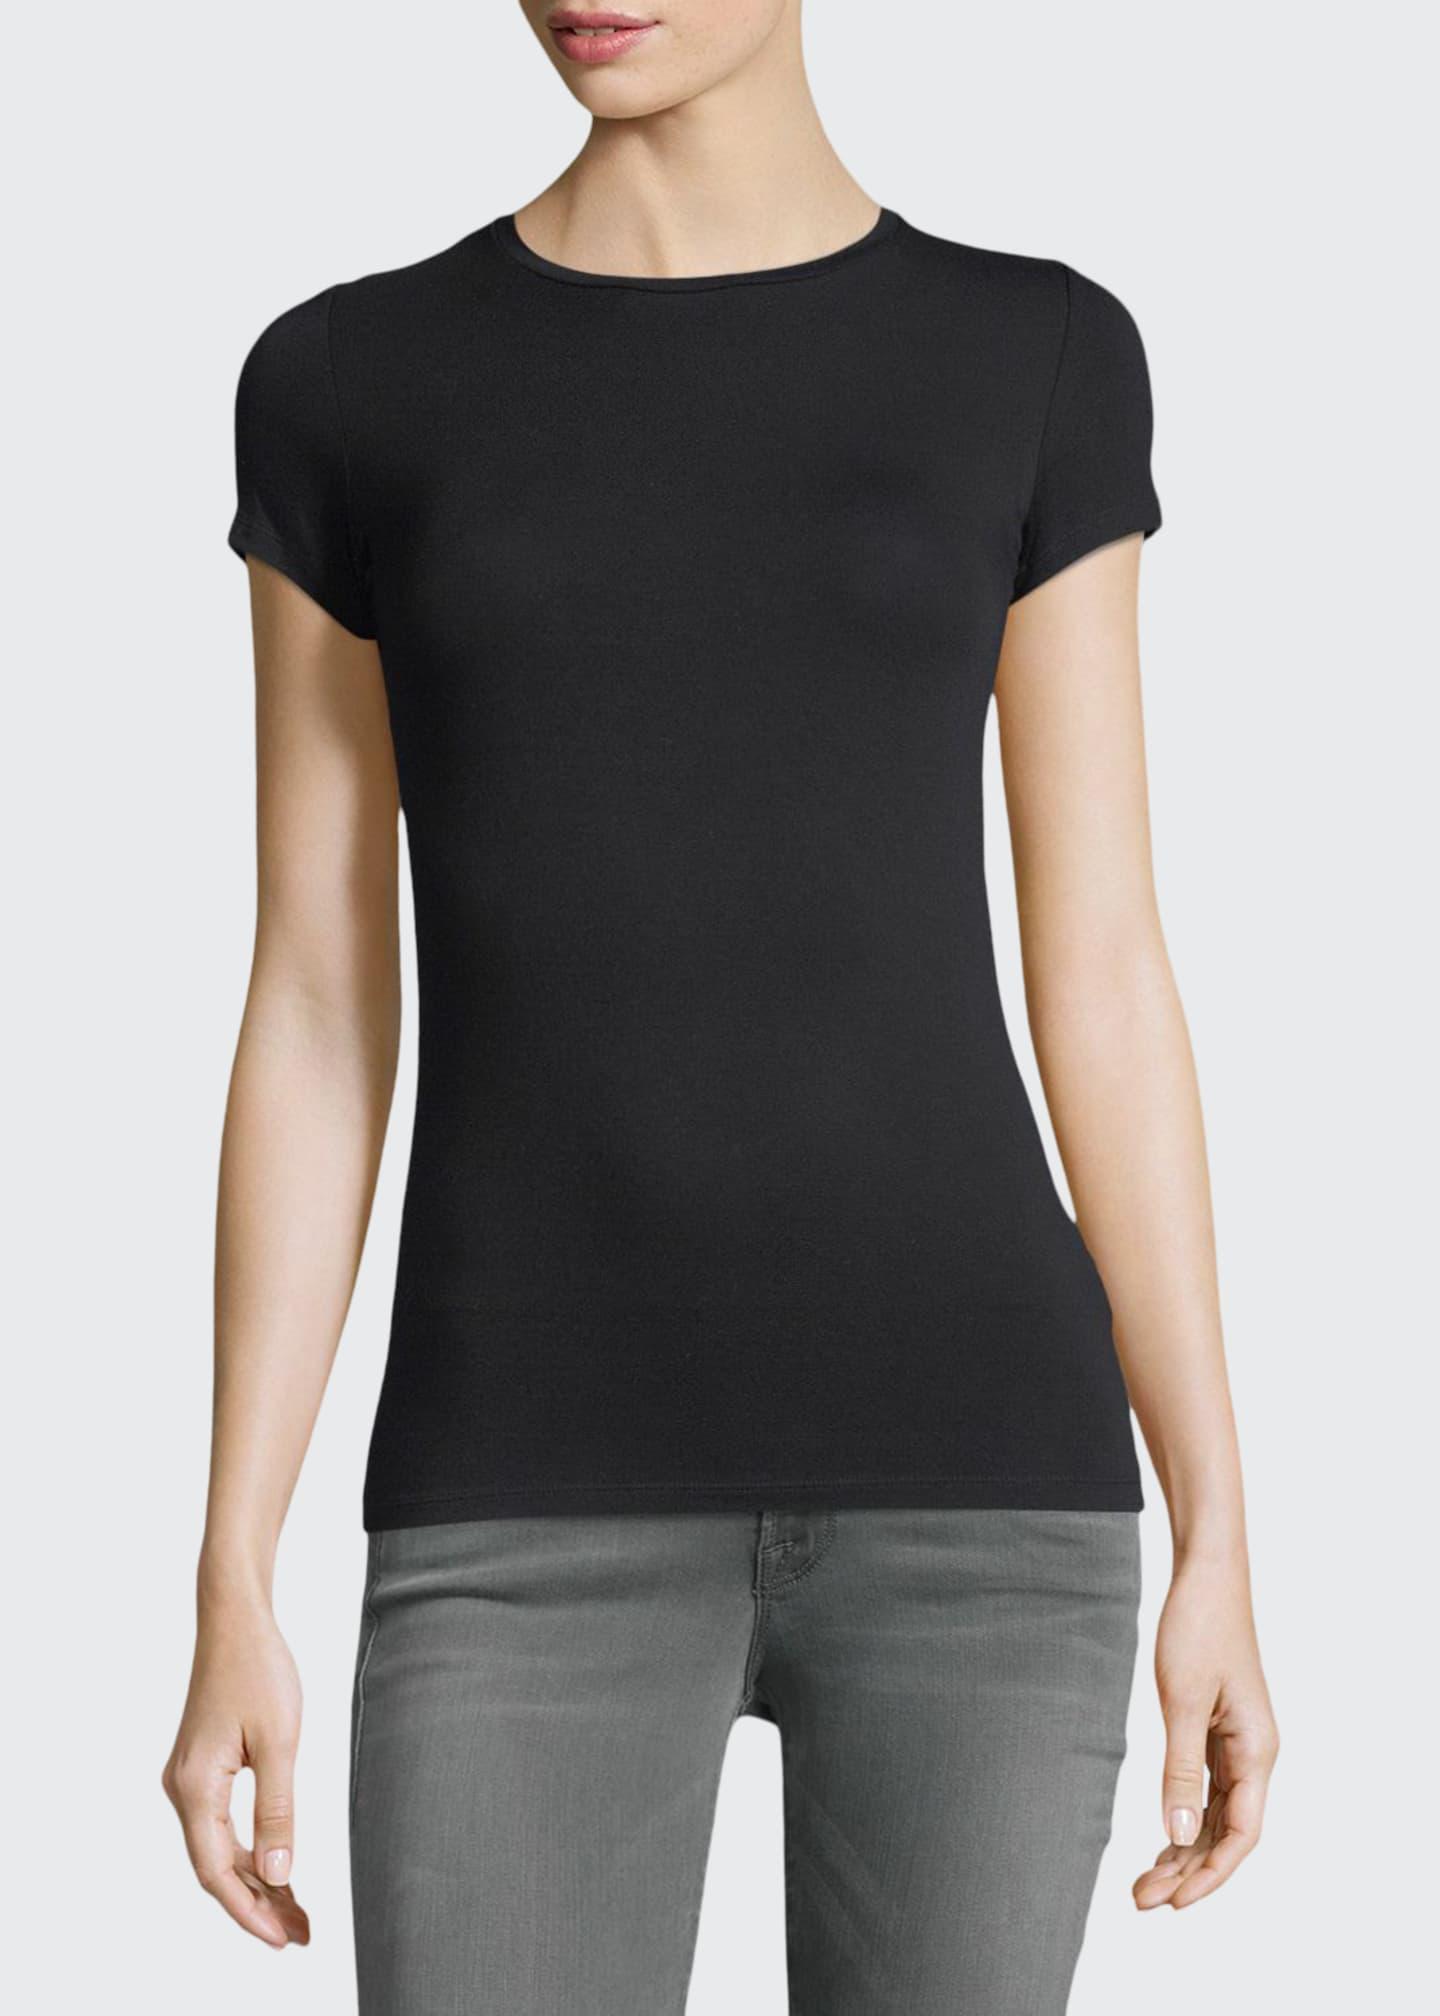 Majestic Soft Touch Short-Sleeve Crewneck T-Shirt